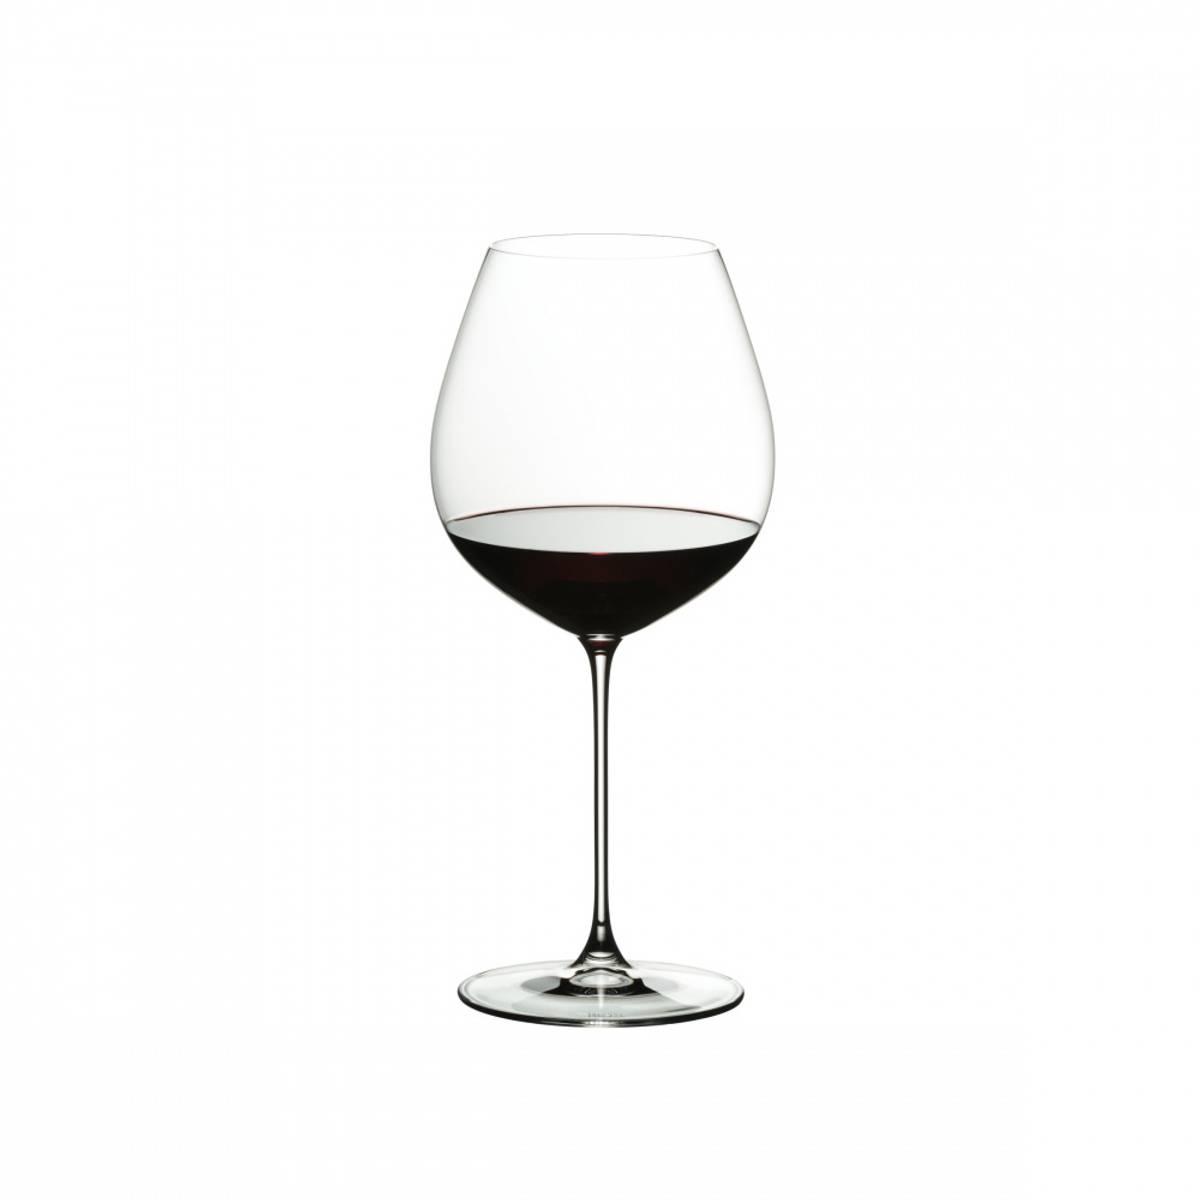 RIEDEL Veritas Old World Pinot Noir, 4-pk 265-årsjubileum